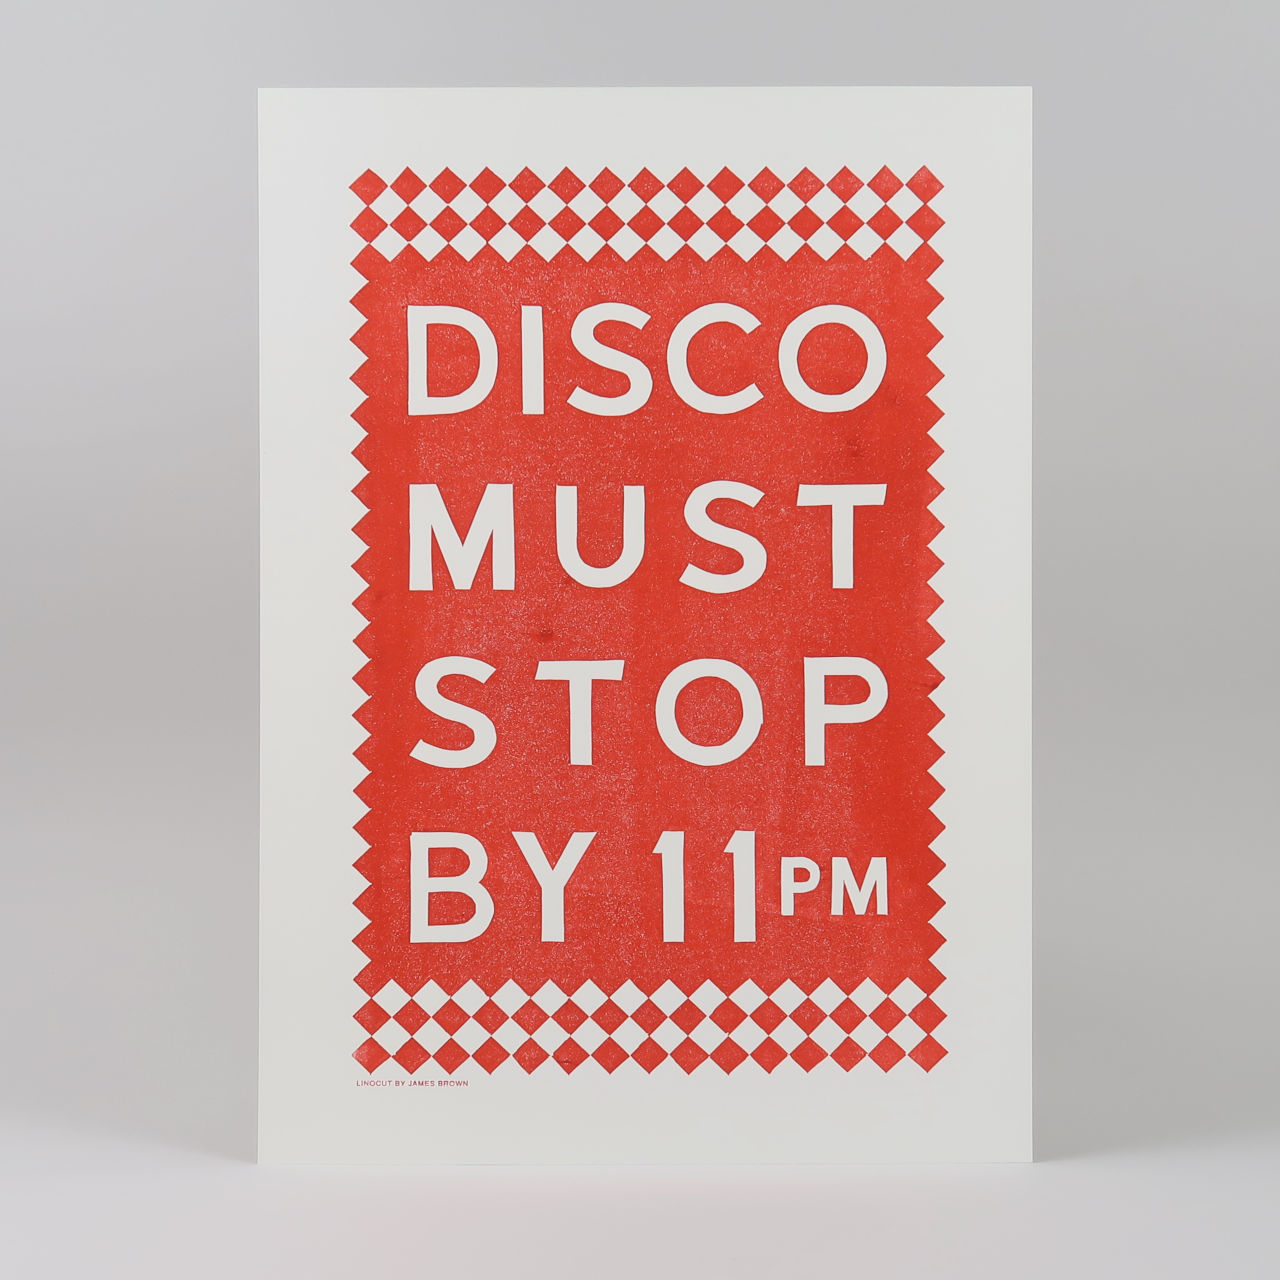 Disco Linoprint by James Brown